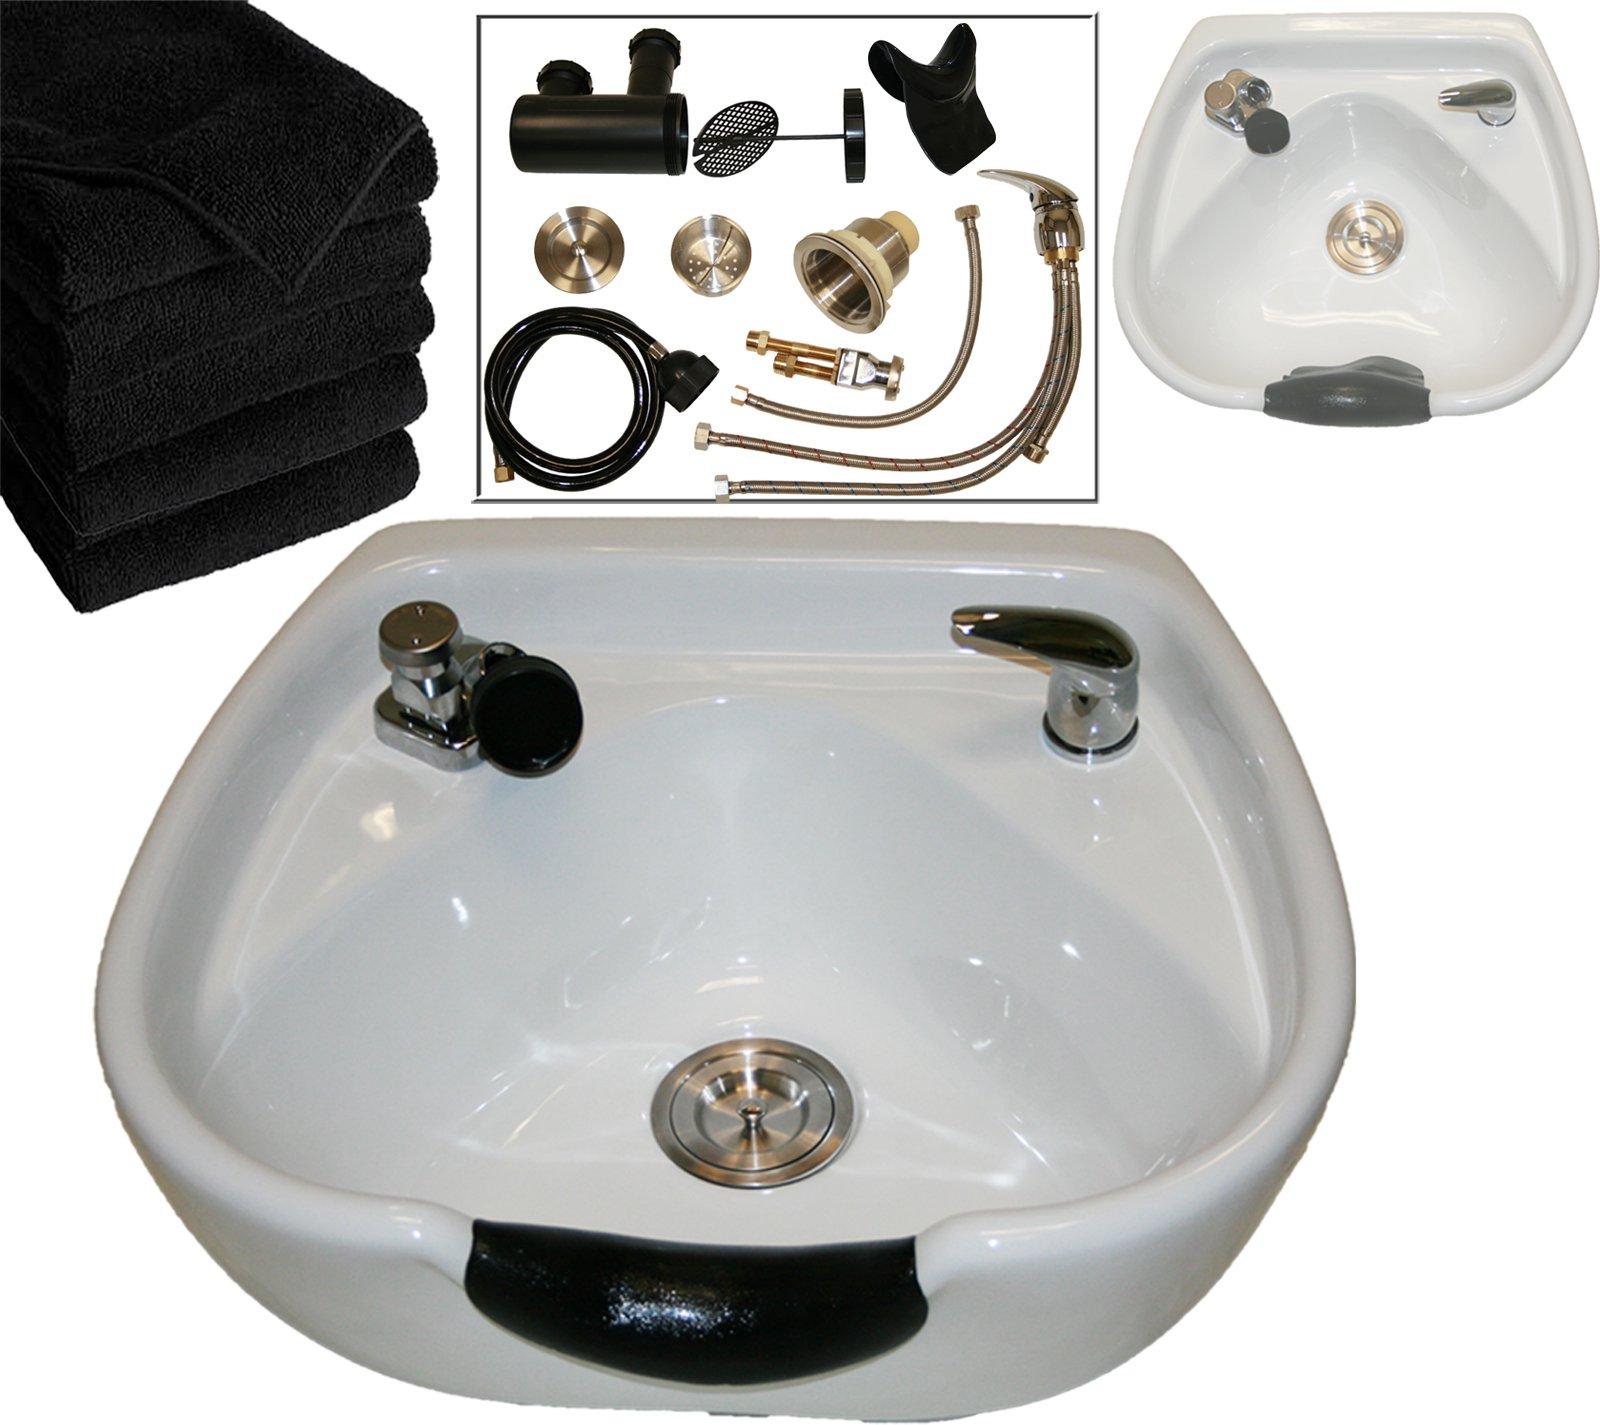 LCL Beauty Heart Shaped Heavy Duty CERAMIC Professional White Shampoo Bowl w/ Vacuum Breaker & 6 Black Absorbent Salon Quality Towels